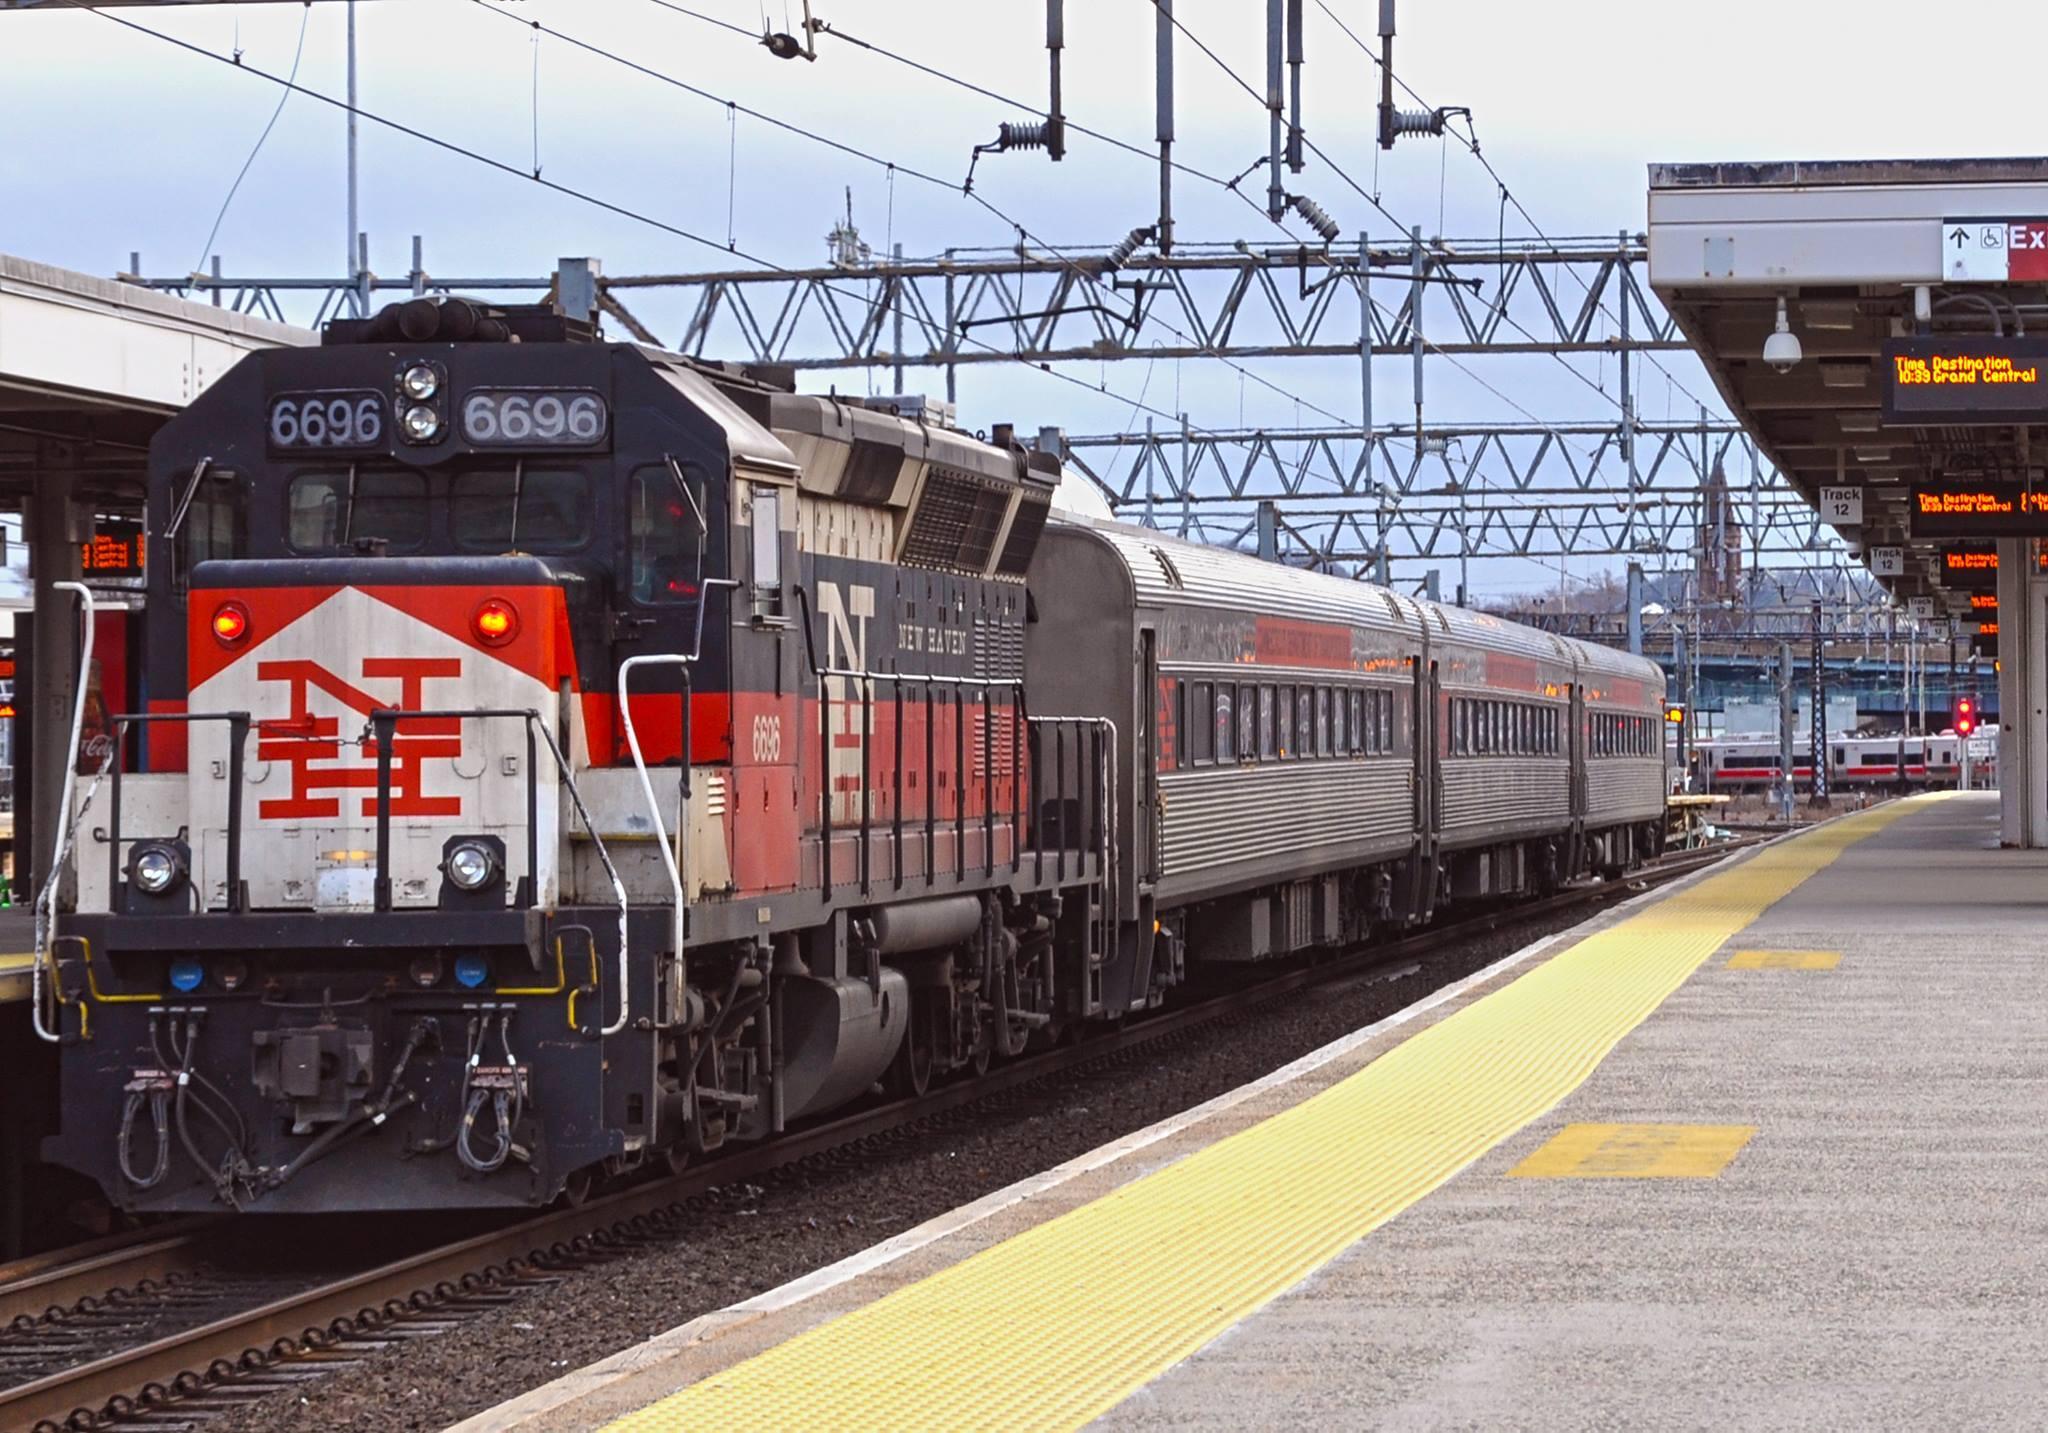 conn dot vows improvements to shore line east service wshu